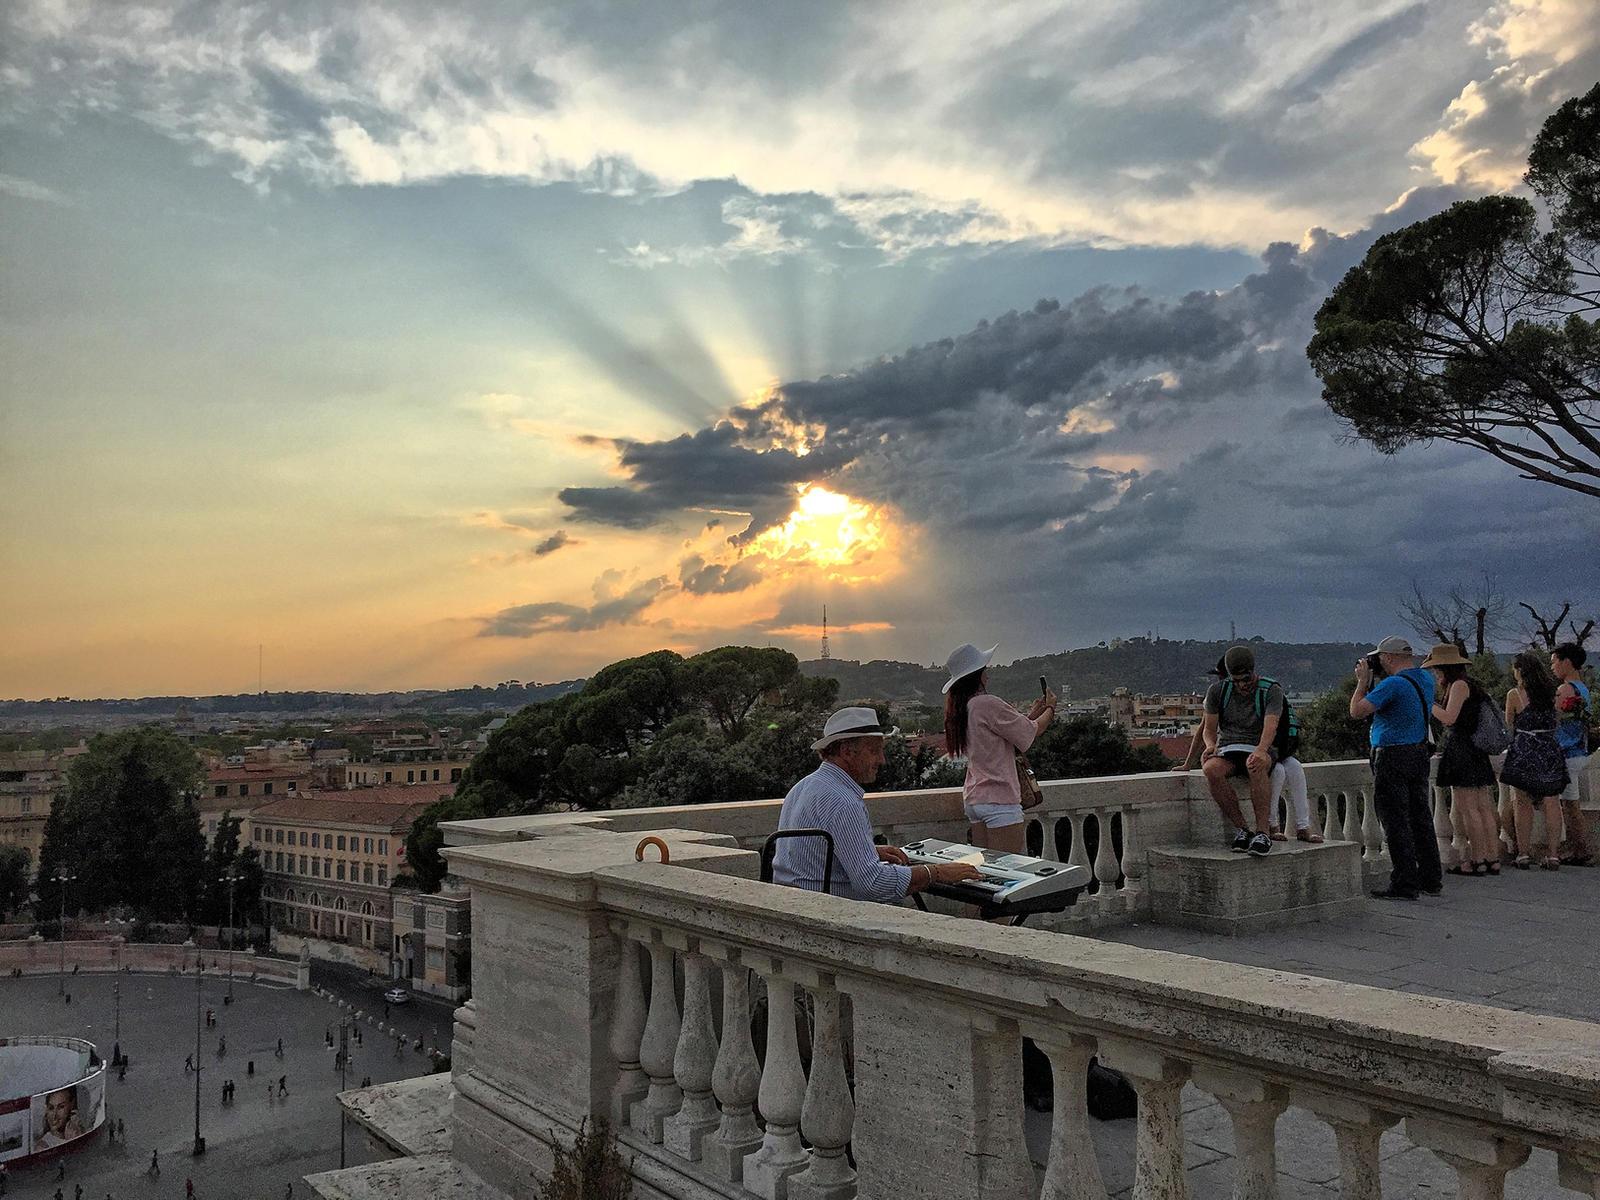 Terrazza Del Pincio Rome Italy By Flamenfloralis On